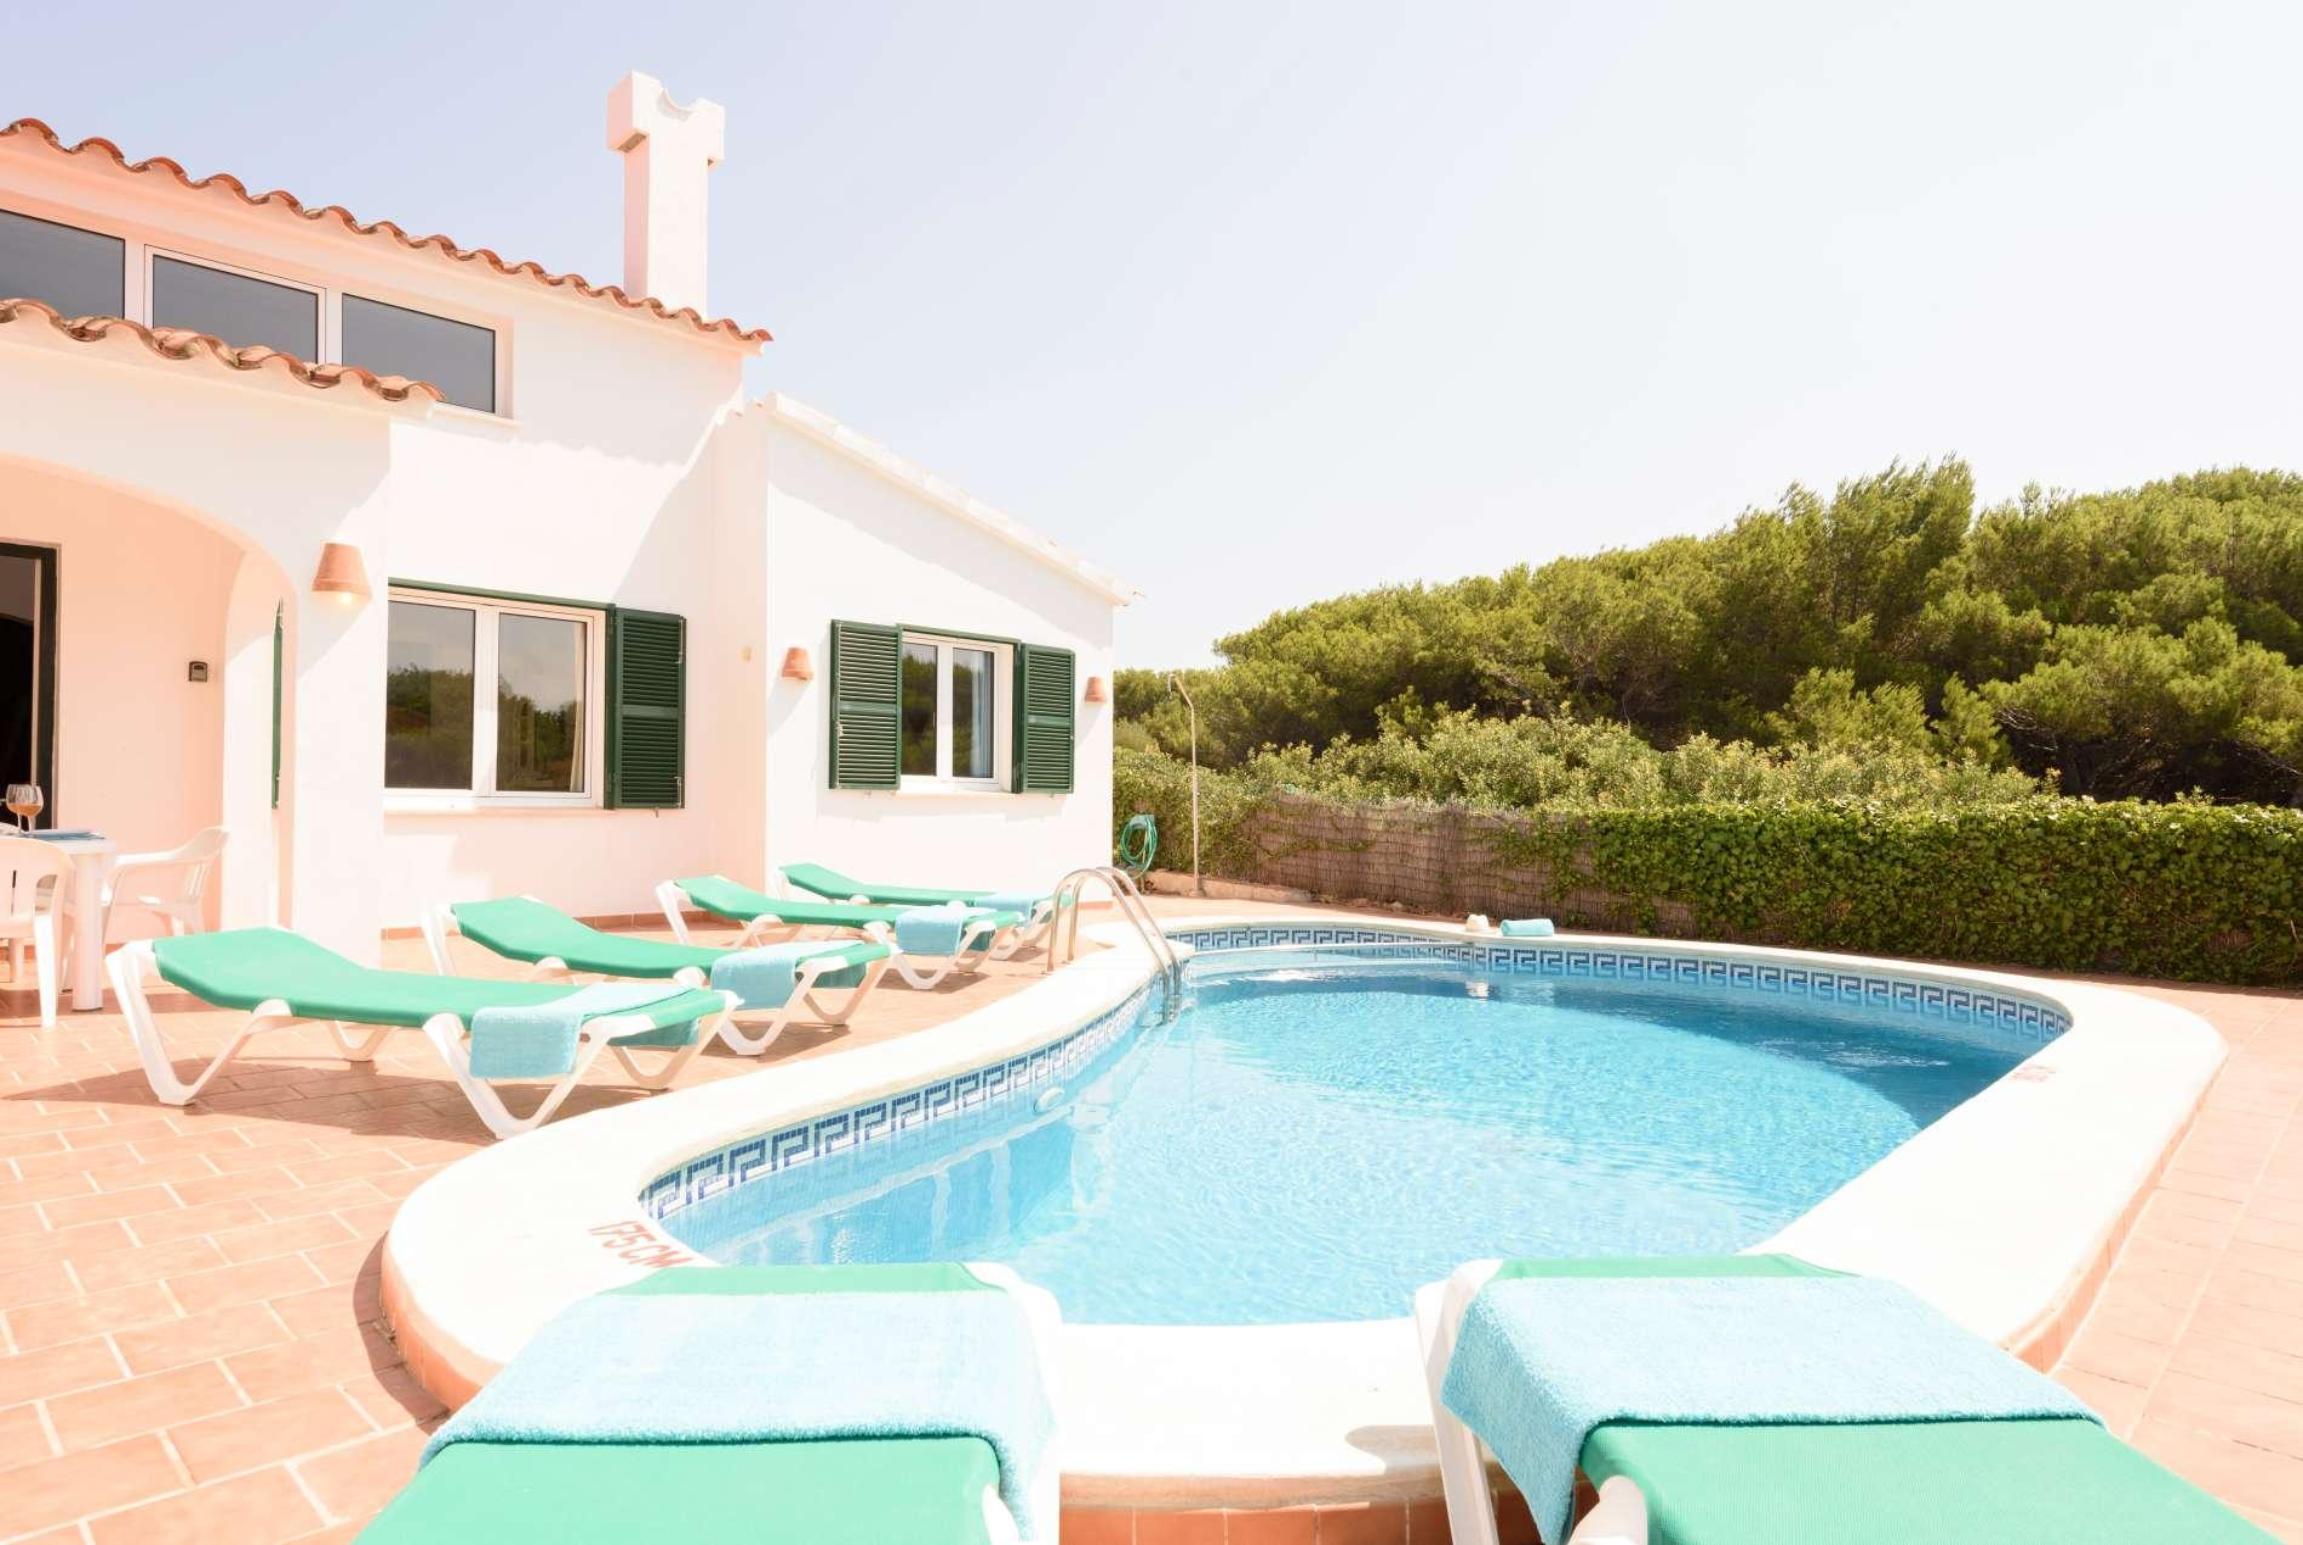 Ferienhaus Eulalia I (2653535), Arenal De'N Castell, Menorca, Balearische Inseln, Spanien, Bild 27